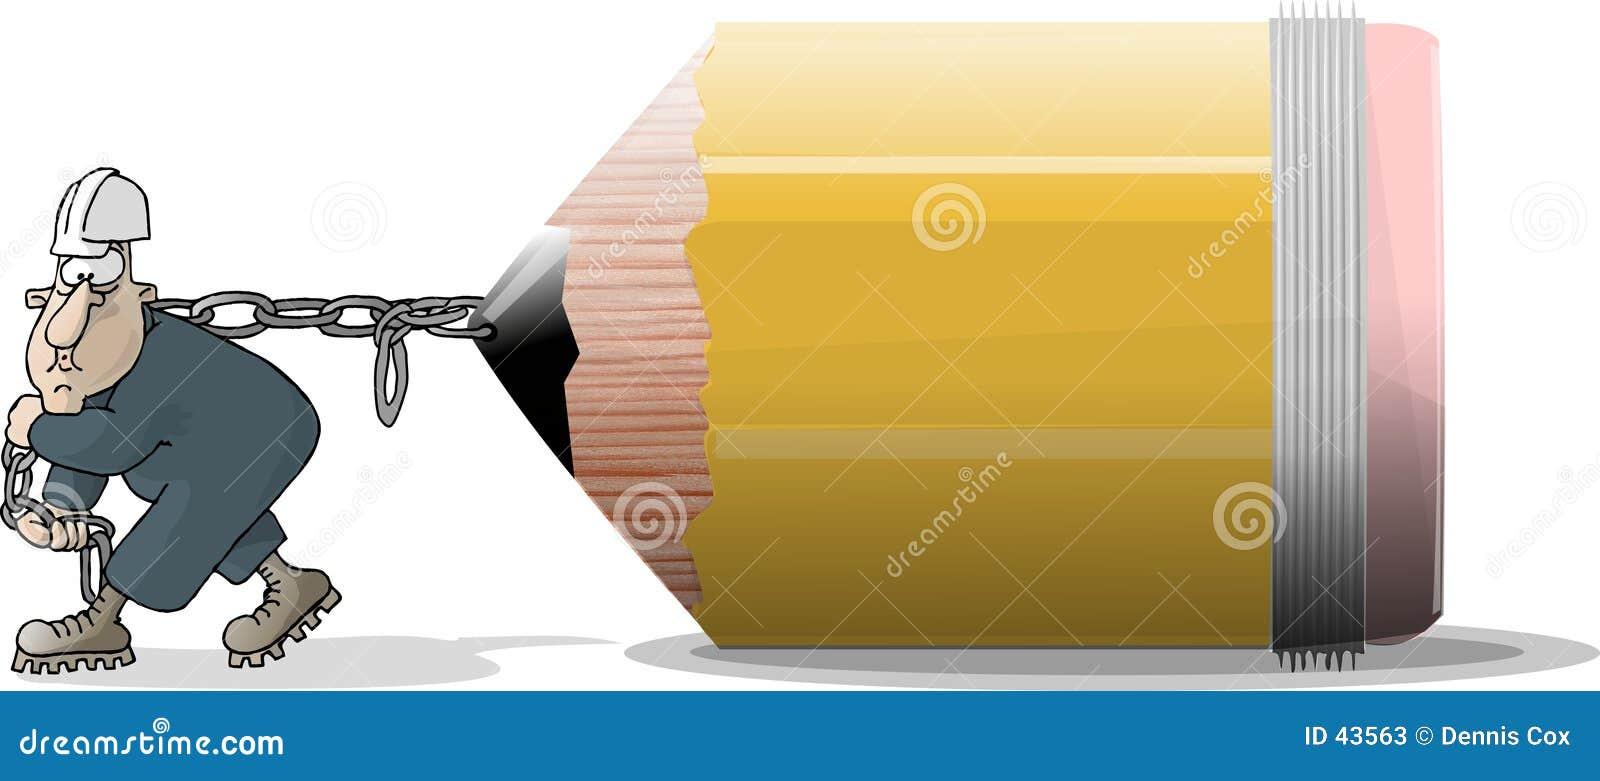 Pencil Puller